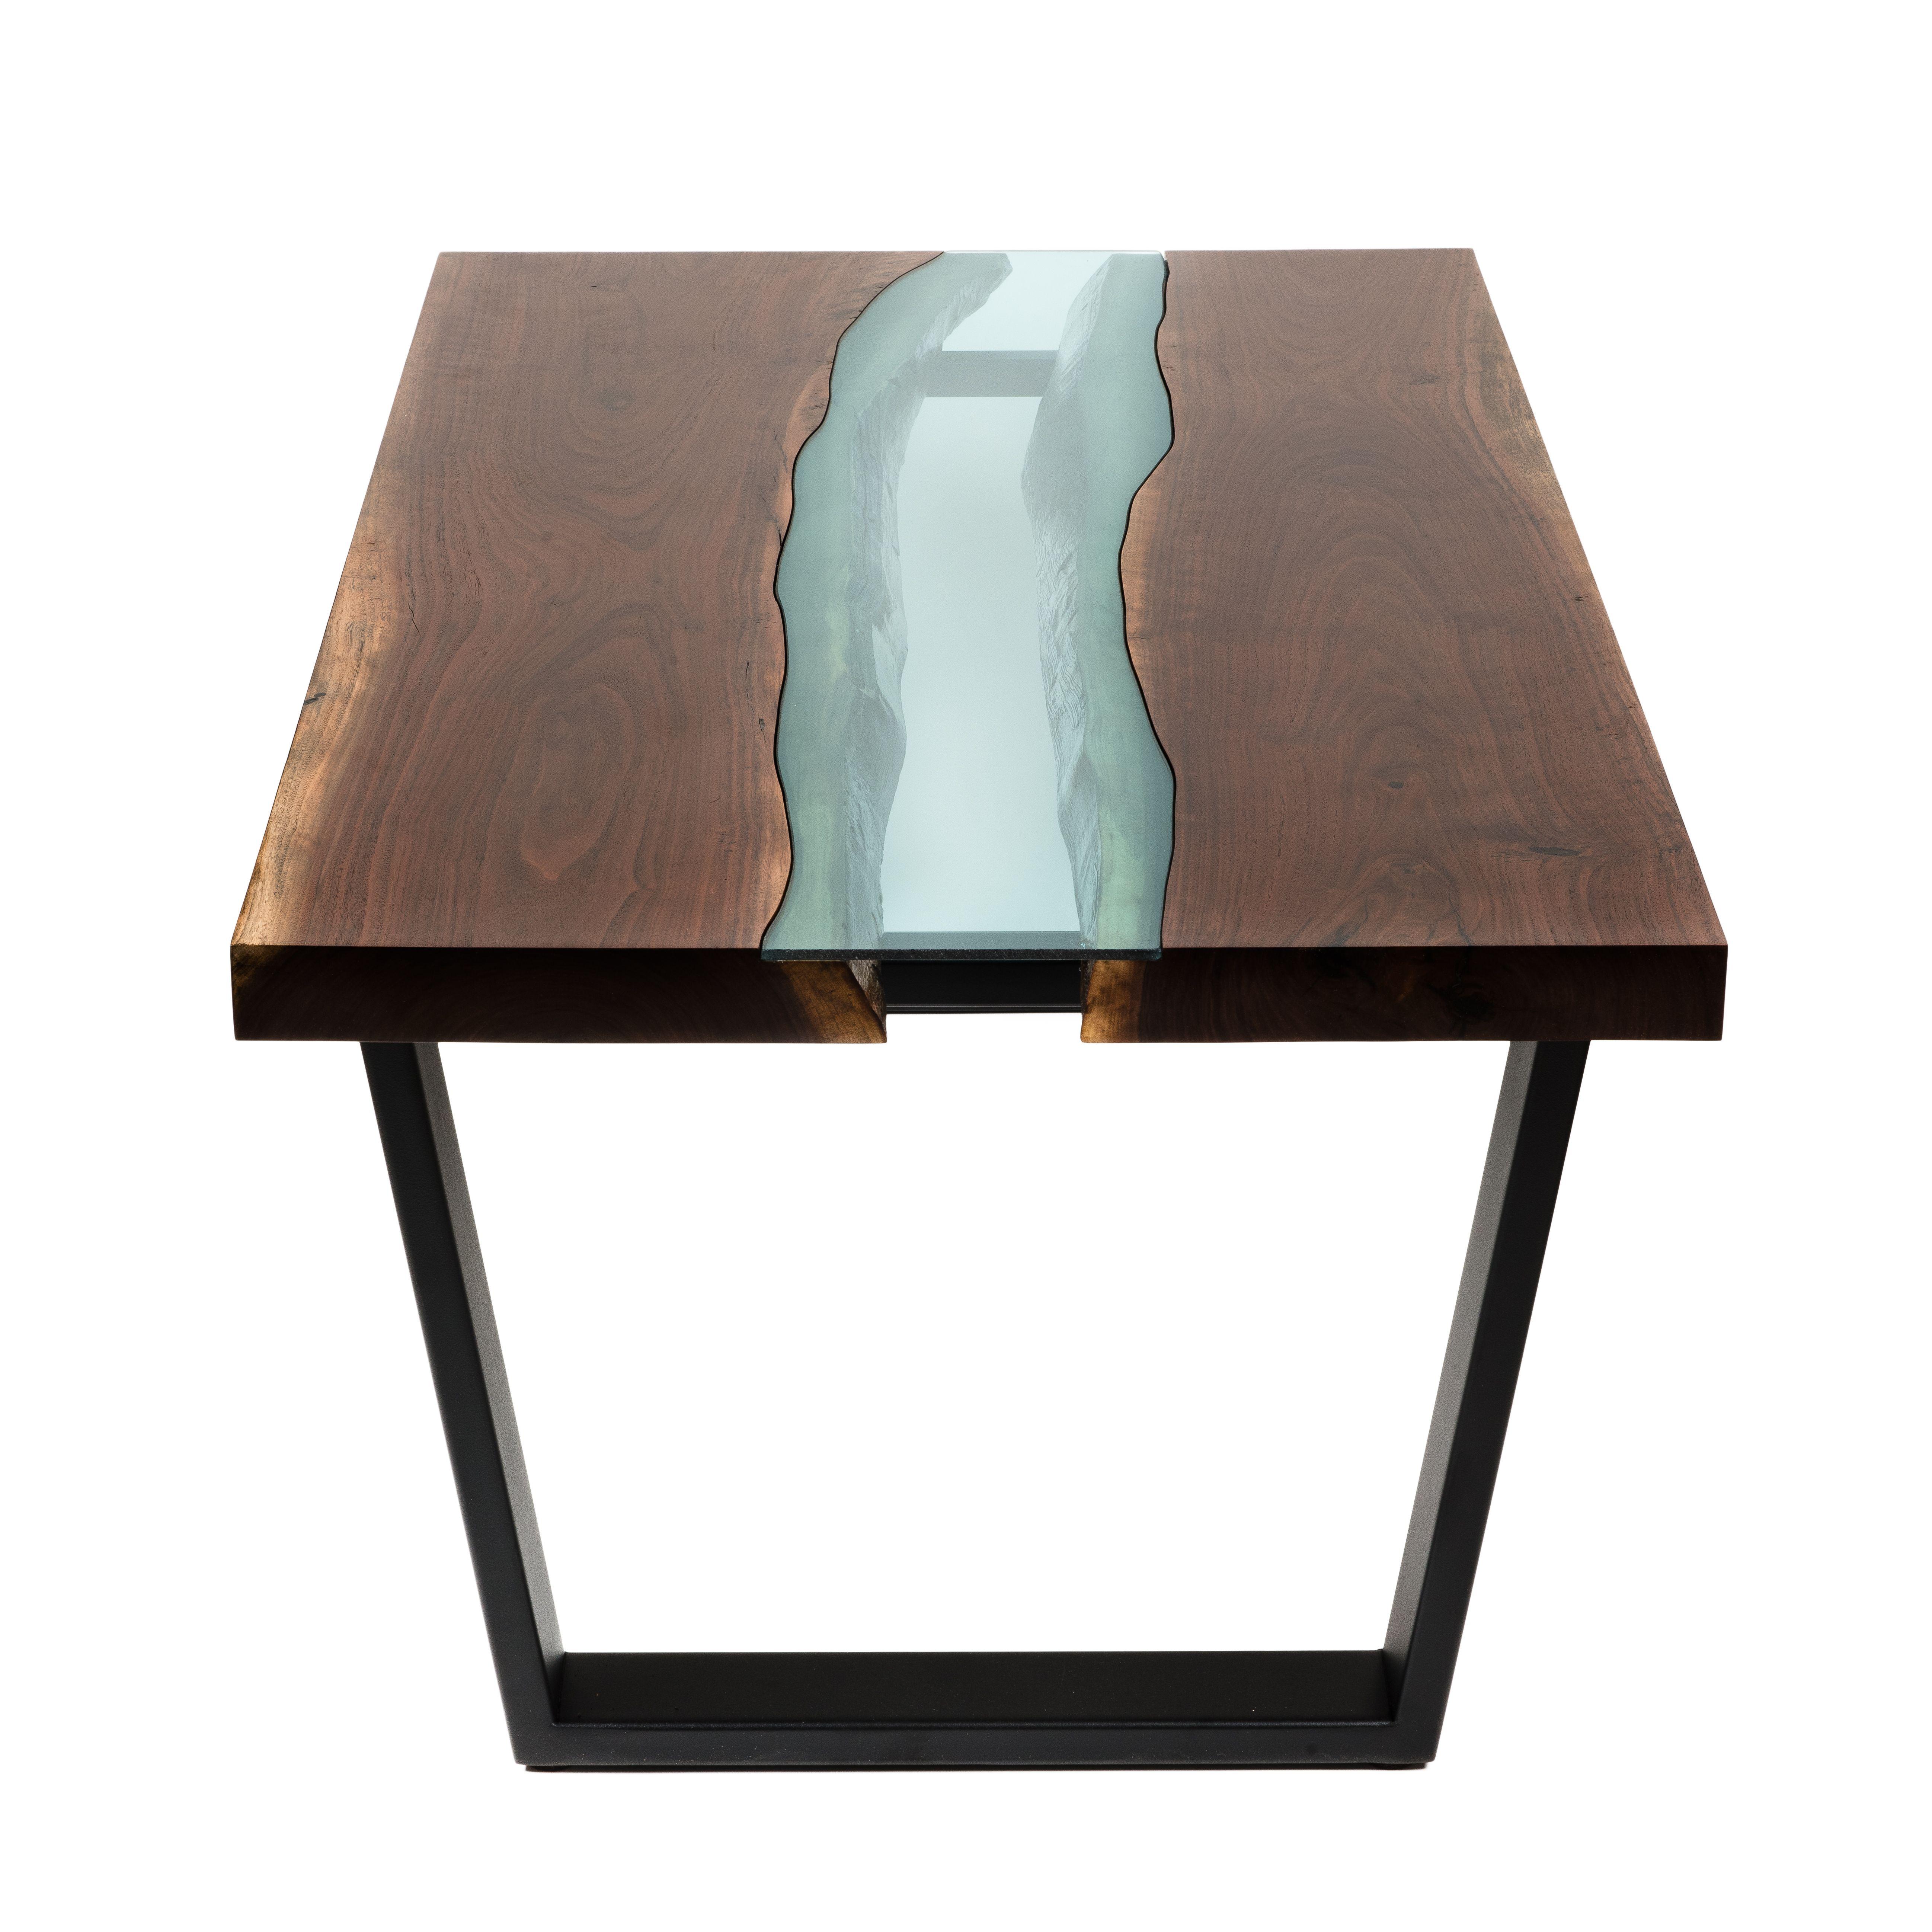 Black Live Edge Coffee Table: Buy A Handmade Live Edge Coffee Table,Black Walnut, Made